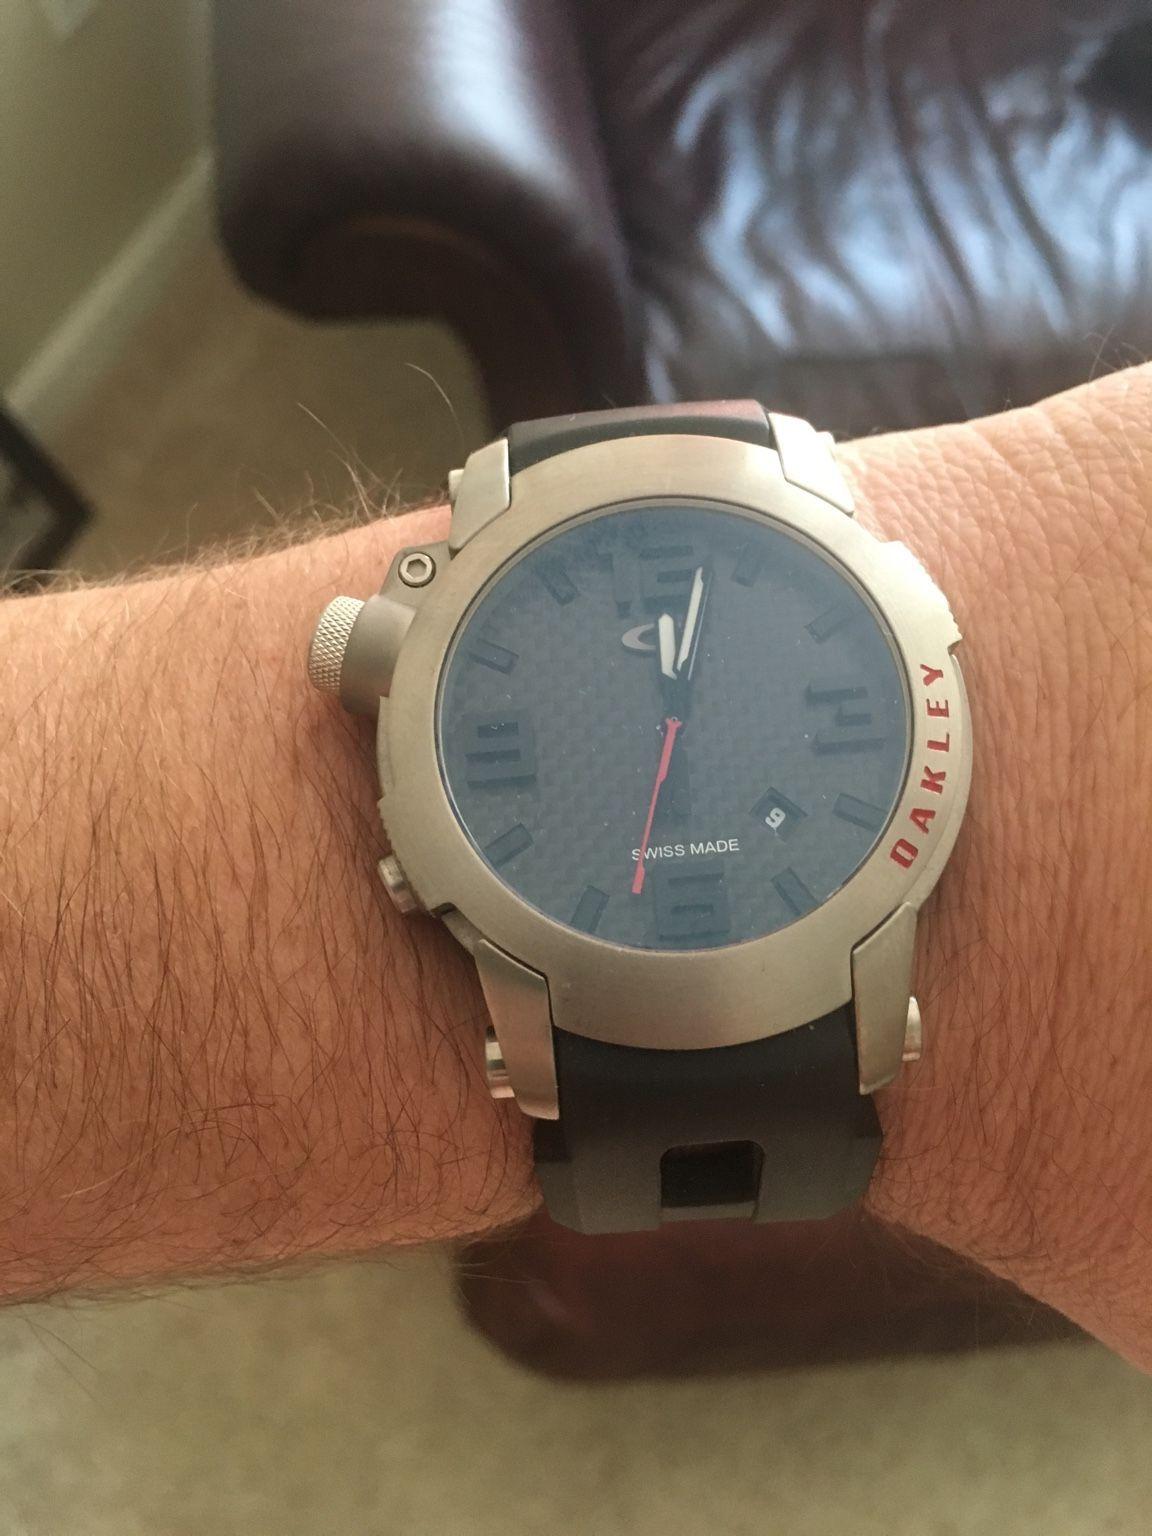 BNIB Holiday Titanium Killswitch Watch - 8c4b6669980aca6fea215122ed89c07c.jpg